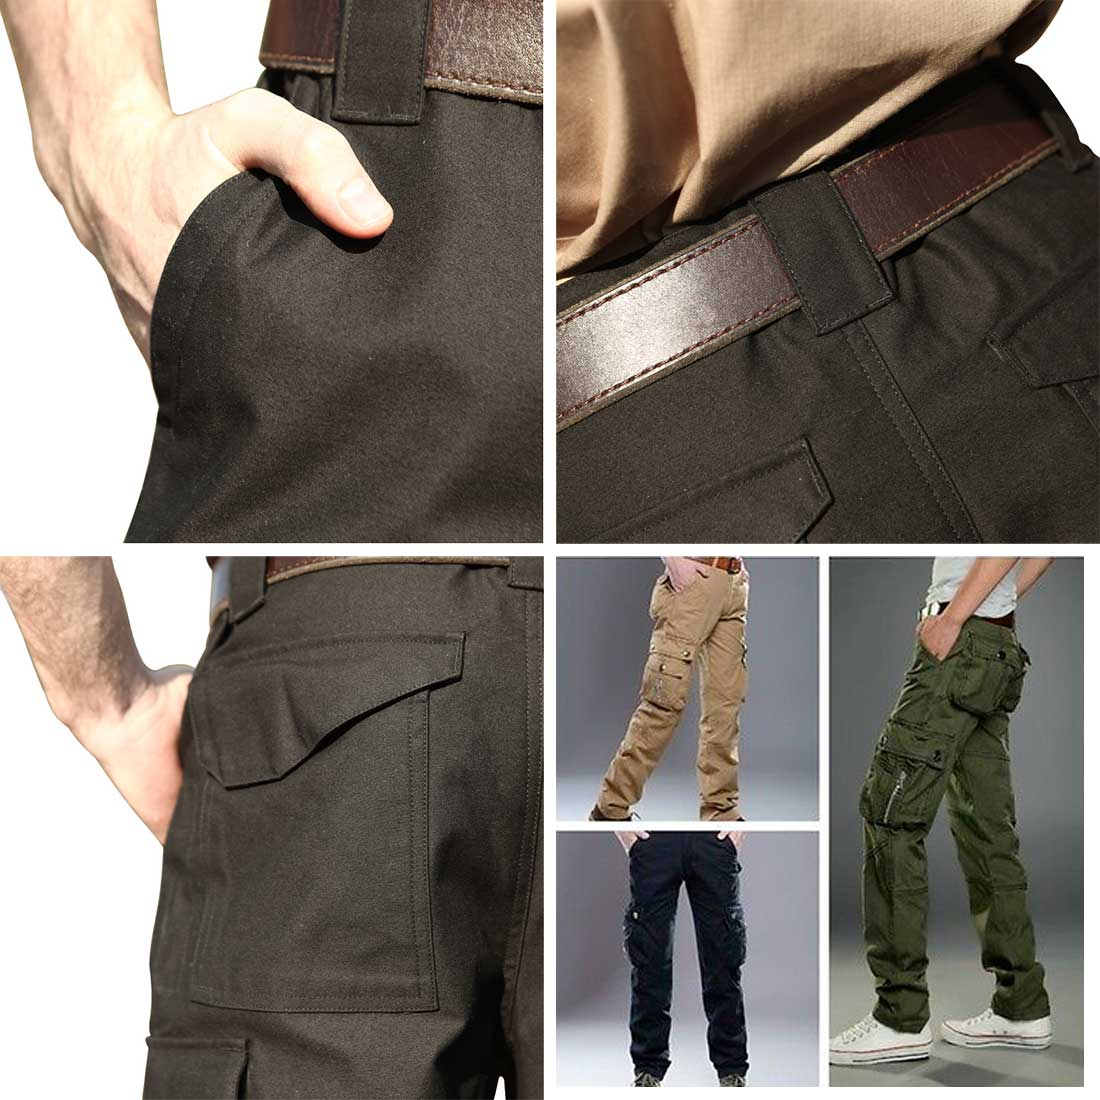 pantalón m65 militar trabajar